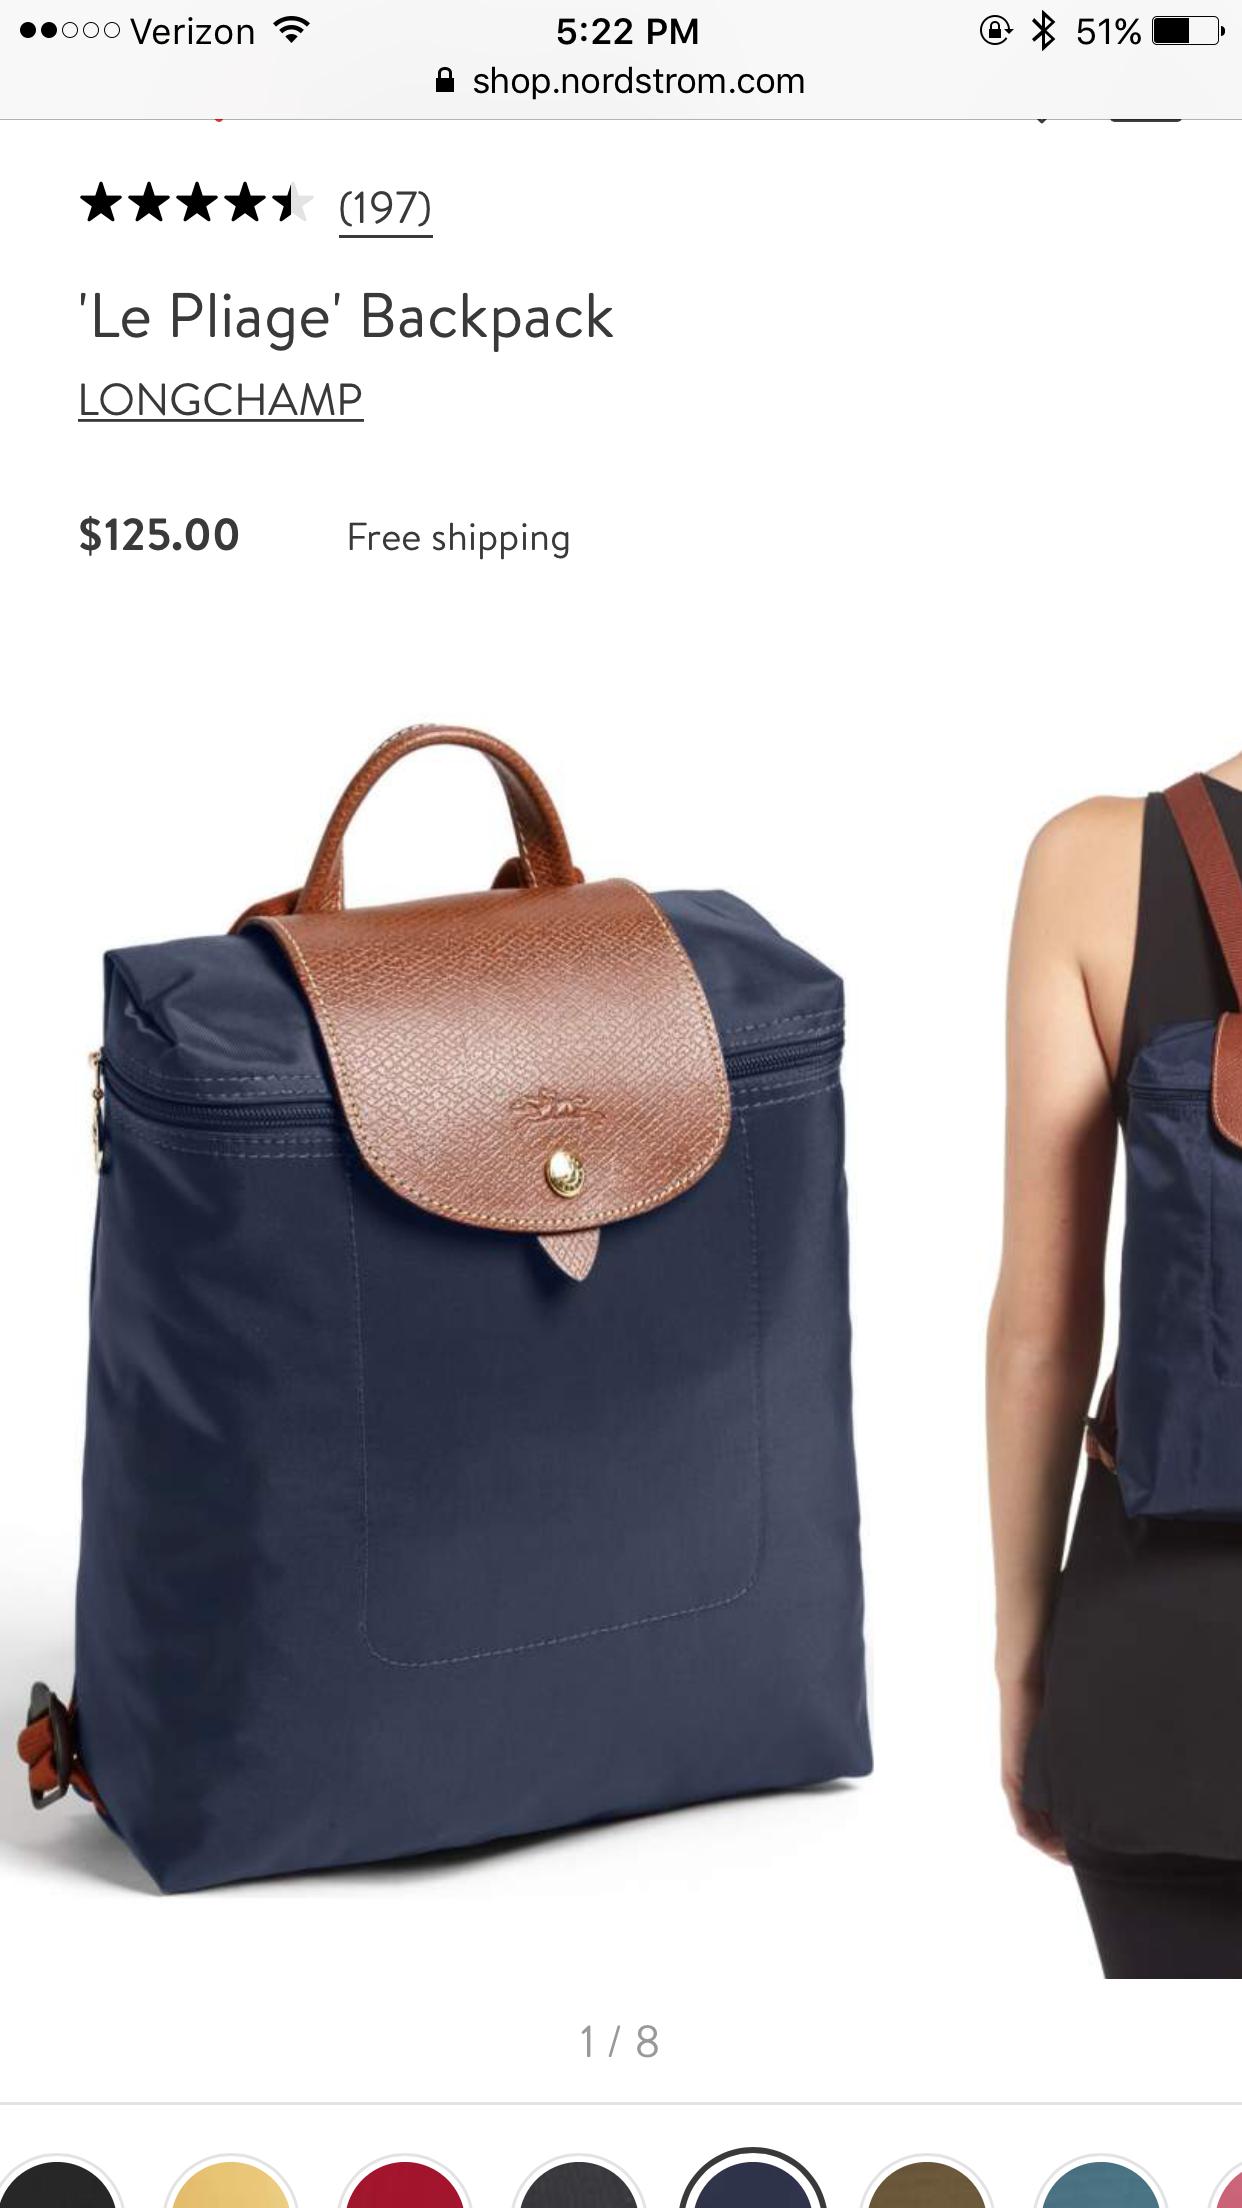 Le Pliage  Backpack LONGCHAMP Color  Navy m.shop.nordstrom ... ca381f8771ba8